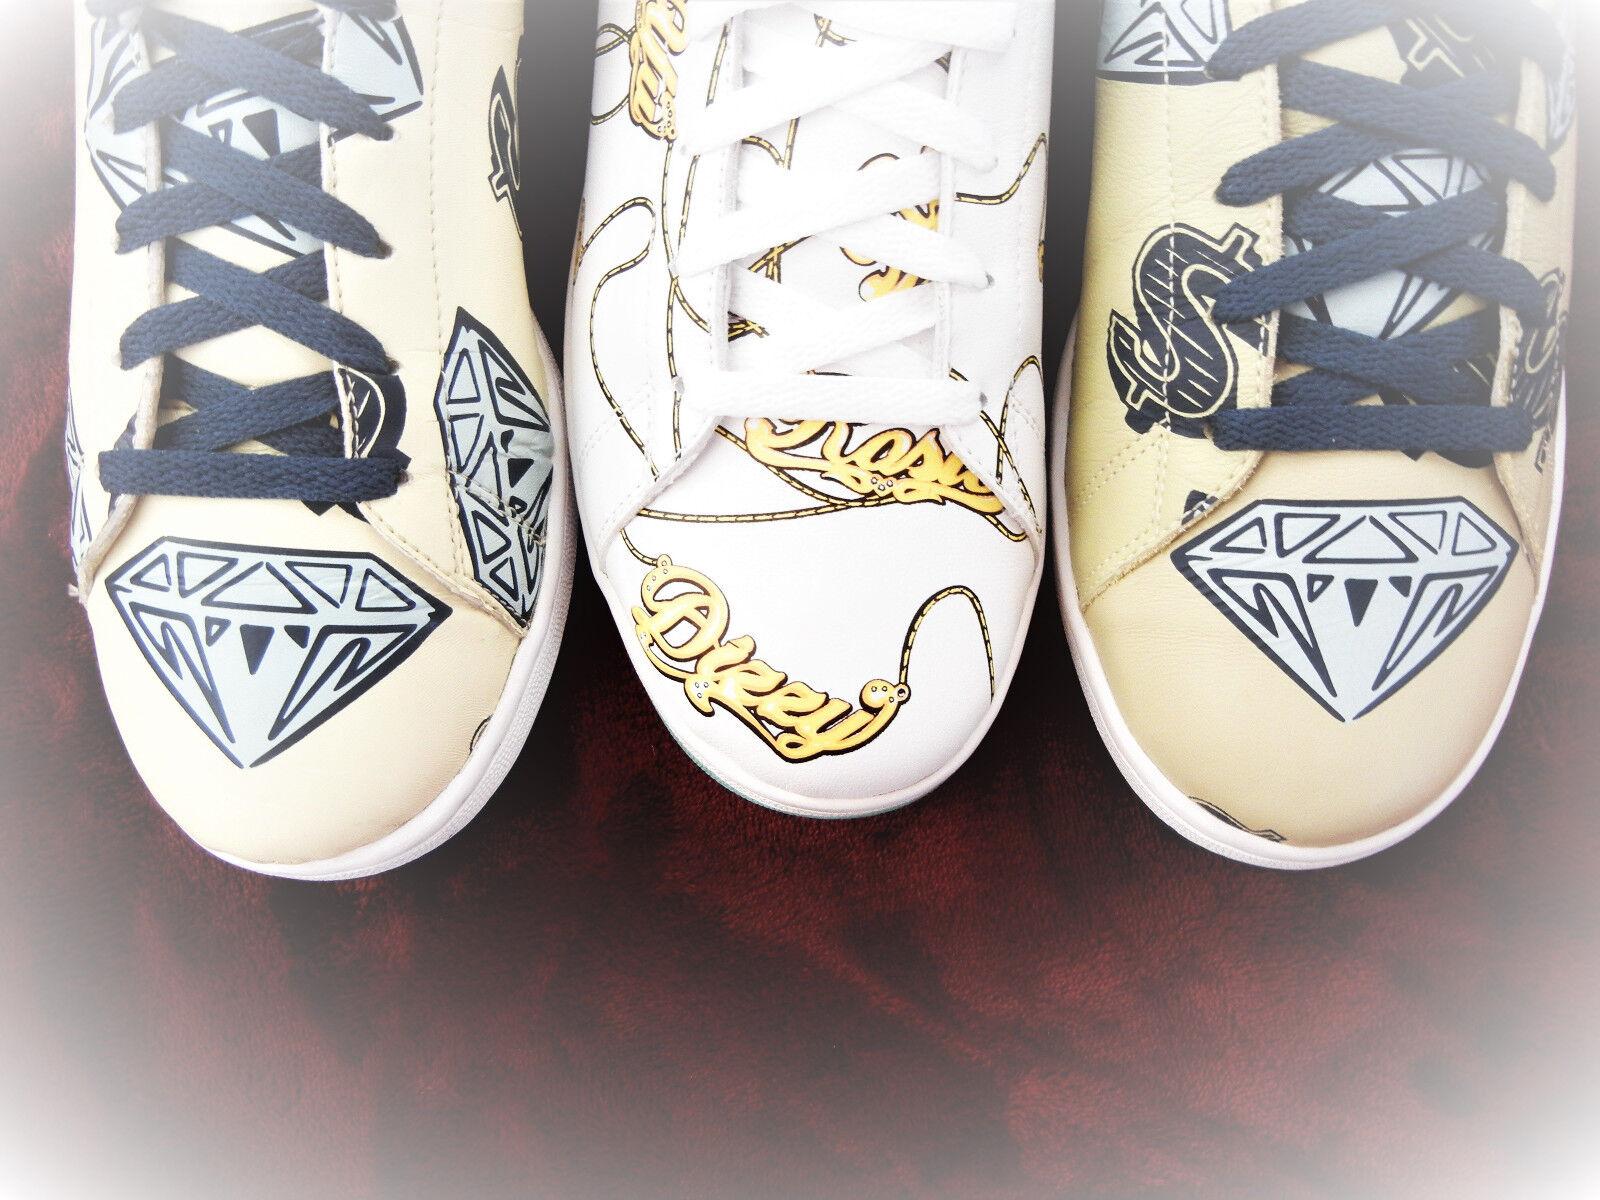 Reebok Ice Cream # boutiques Blanco # Pharrell namechain Zapatillas Tamaño # Pharrell # BBC DS ecec7c